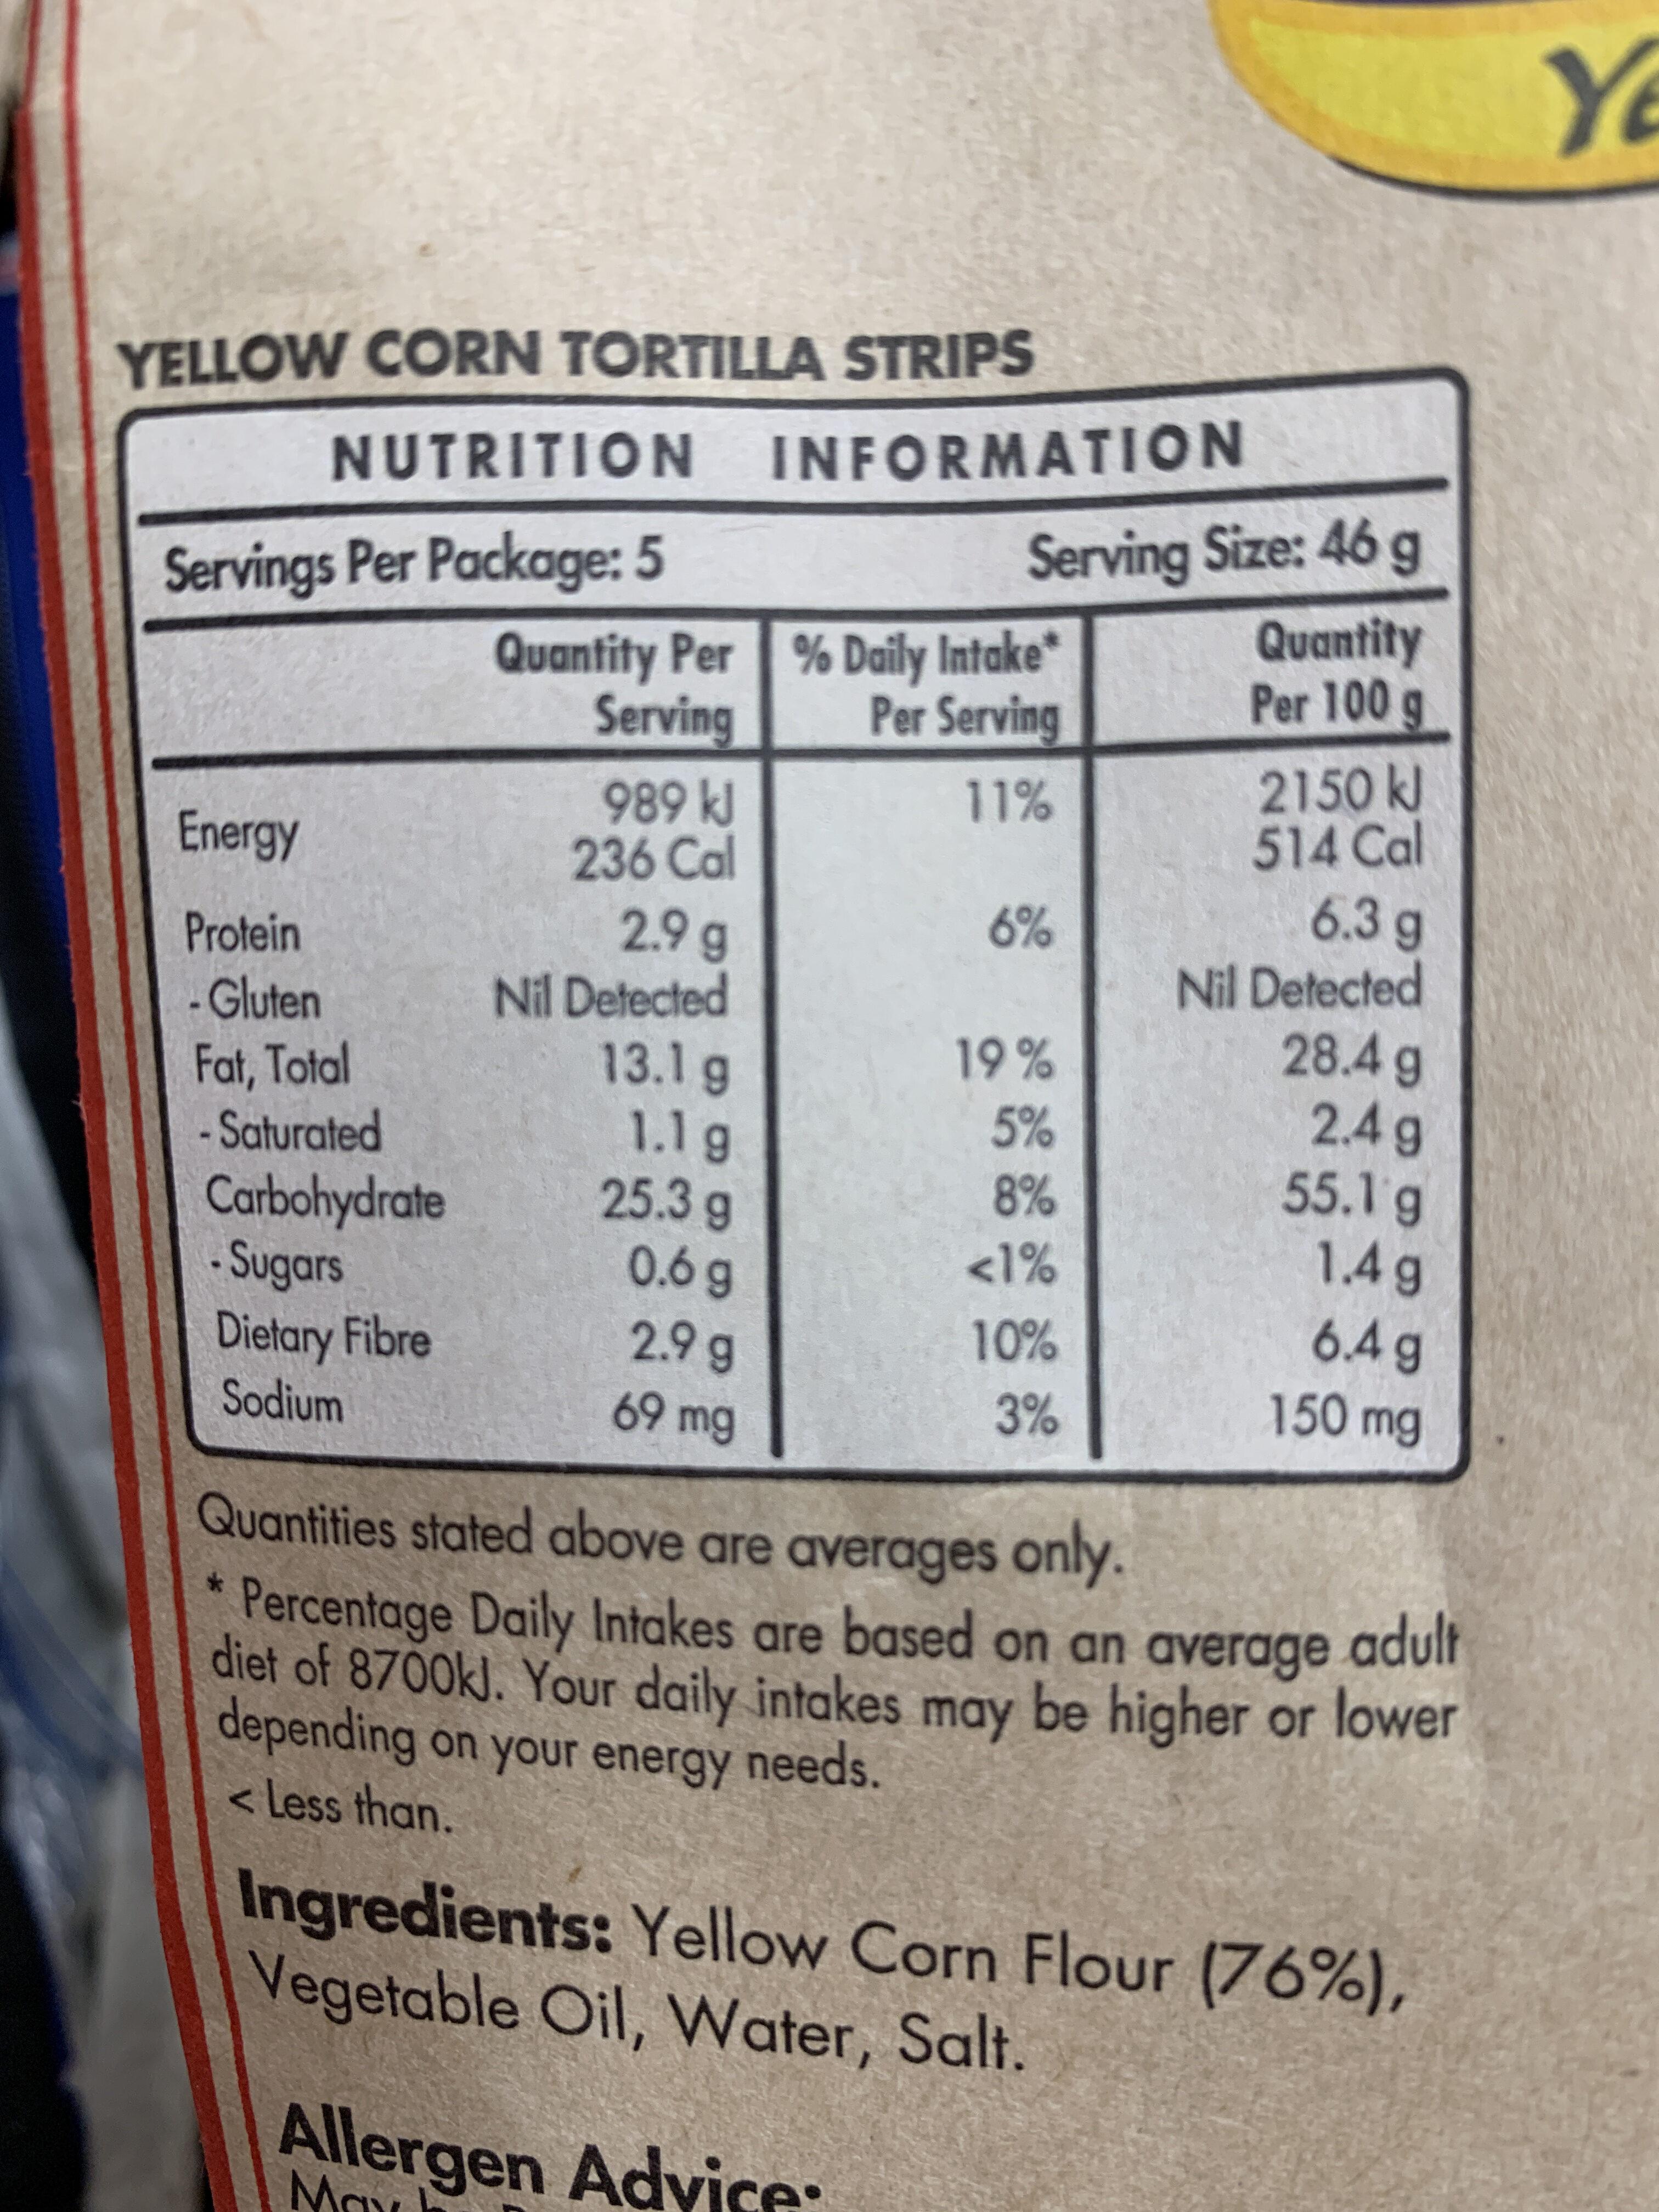 Mission original tortilla strips yellow corn - Nutrition facts - en